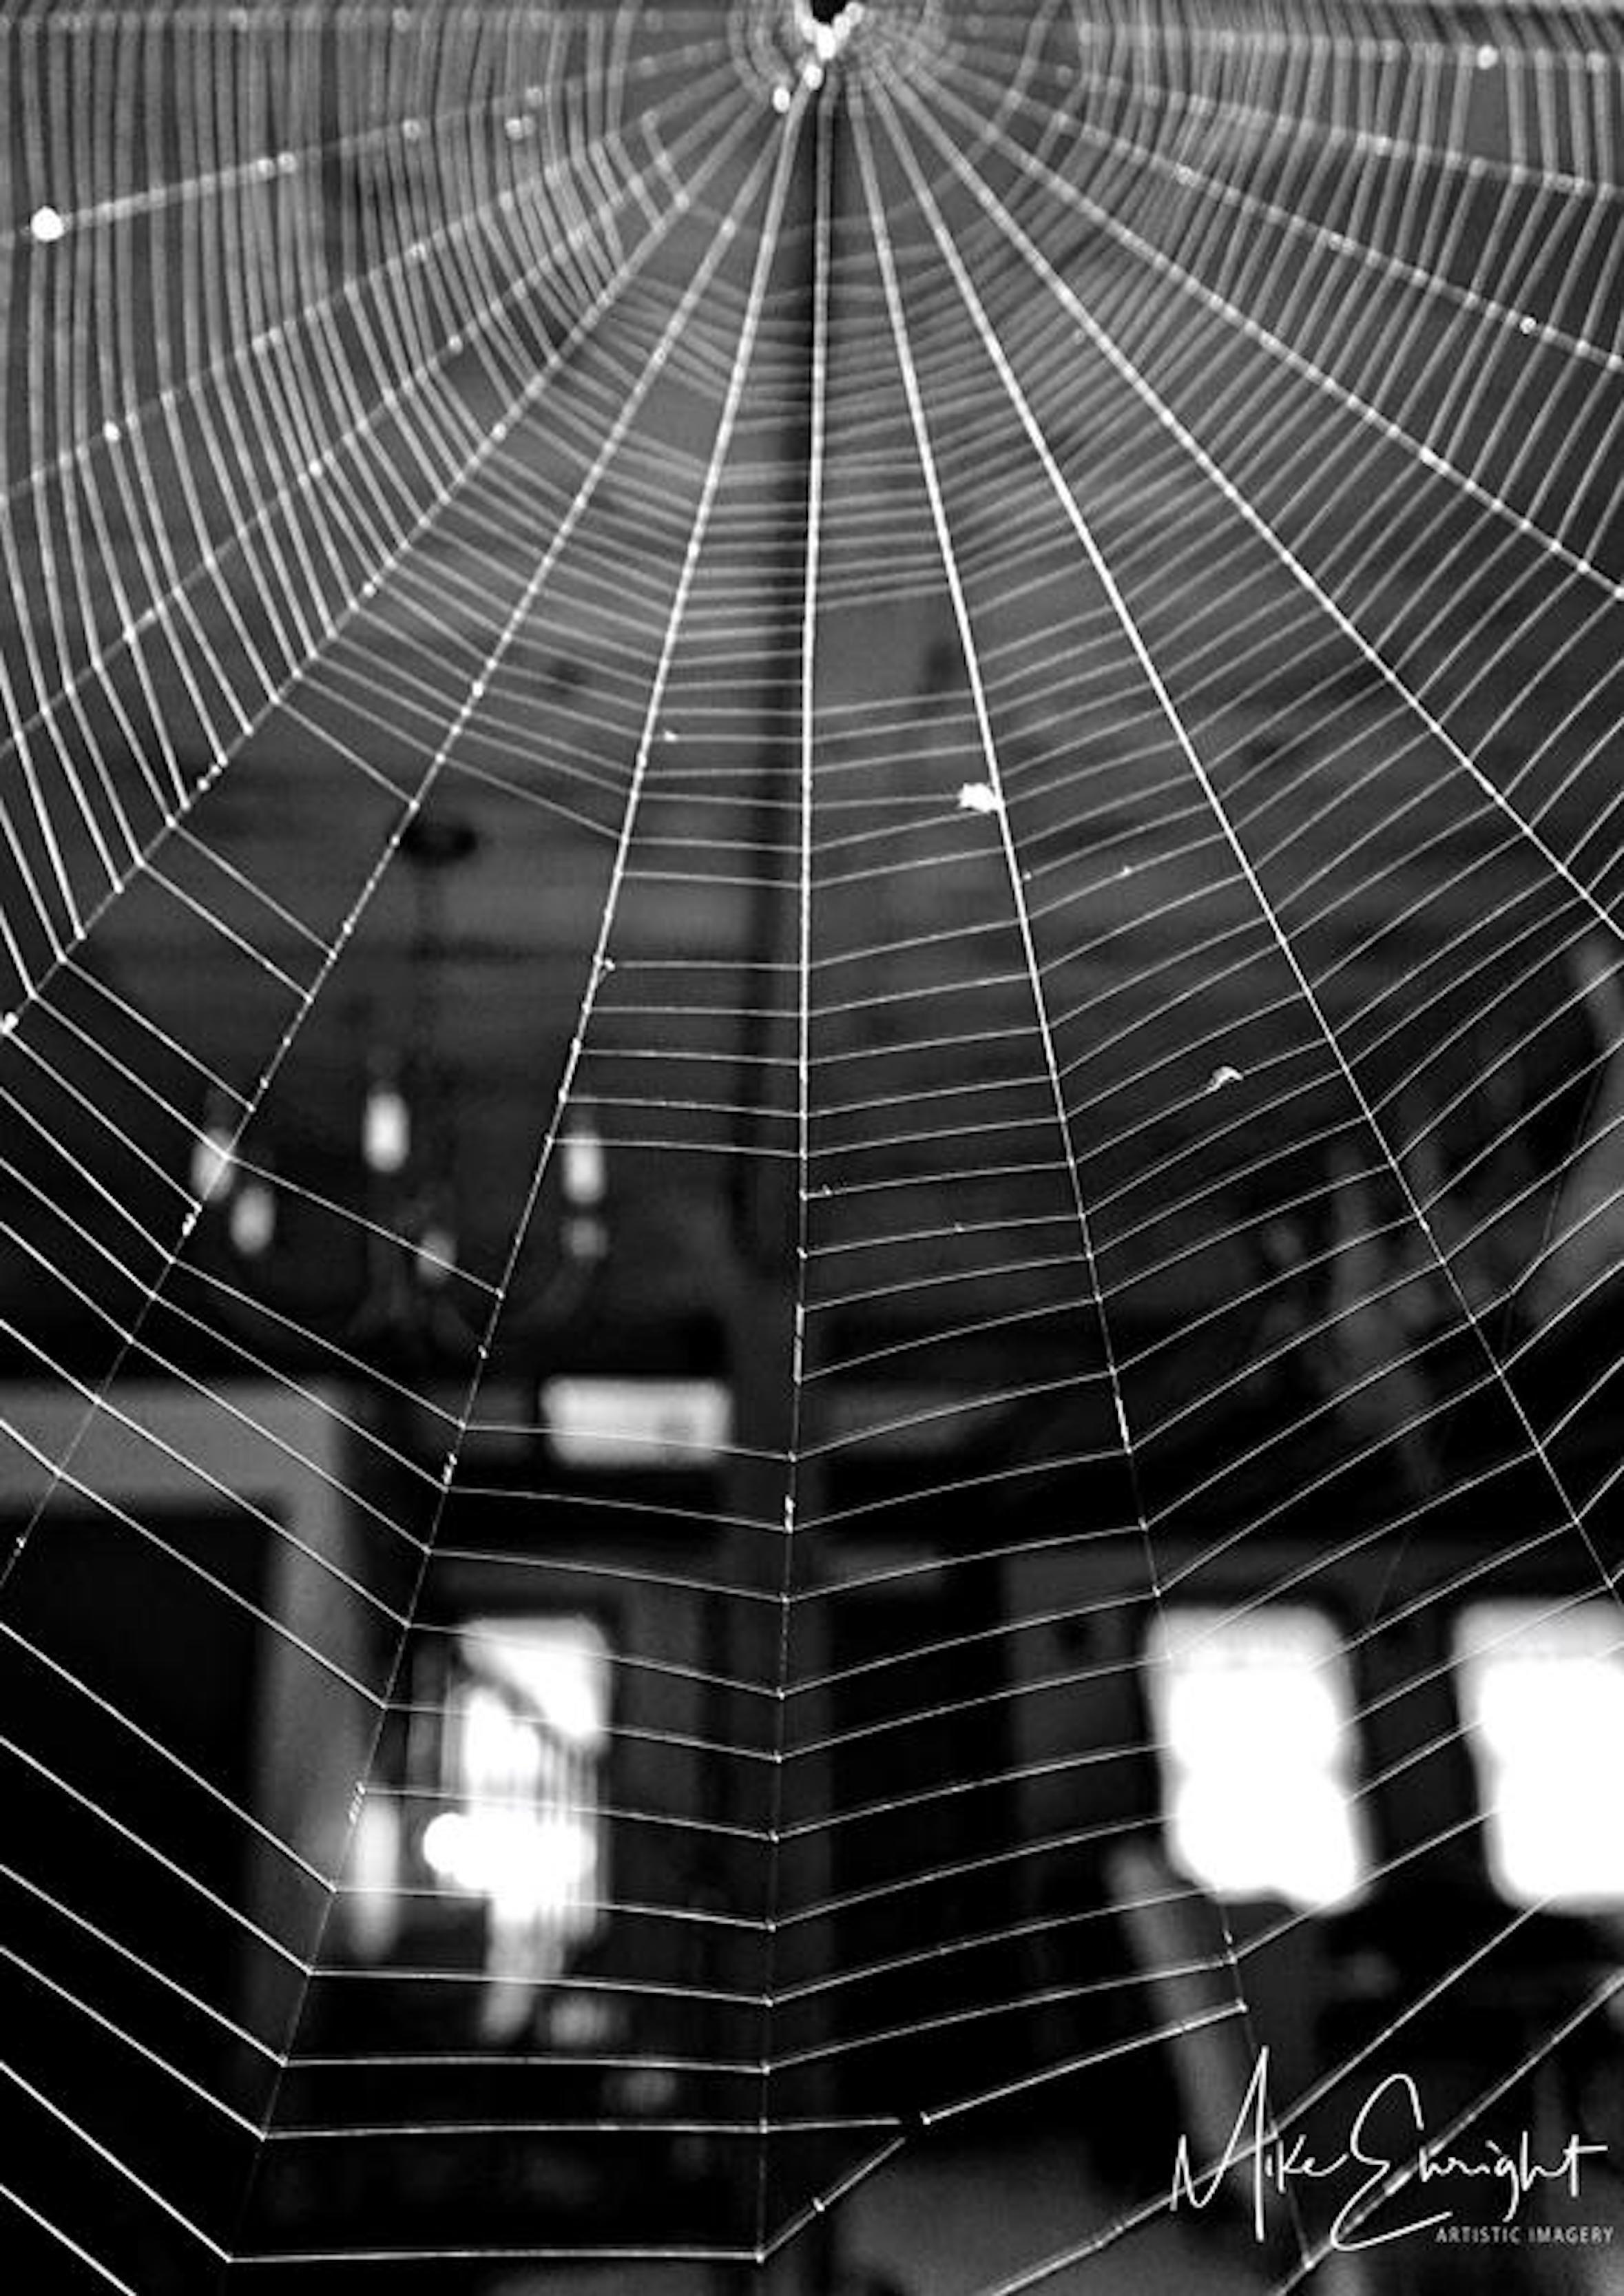 The non-conformist-dsc09408_fotor-arachnitecture-1resized.jpg